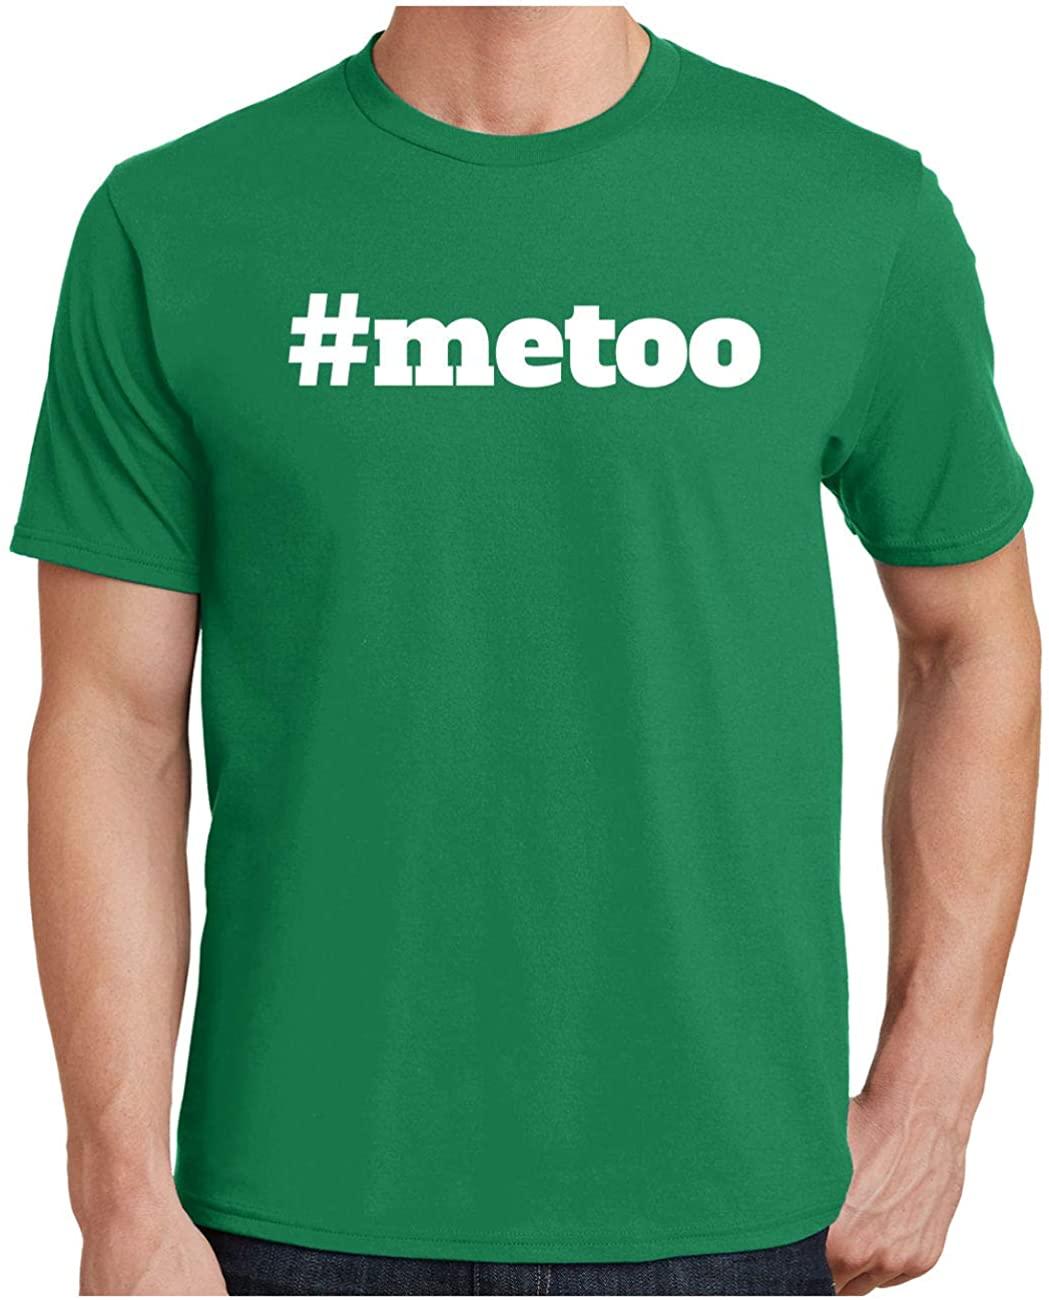 HARD EDGE DESIGN Men's #MeToo Block Plus Size Crew Neck T-Shirt, 5X-Large, Kelly Green